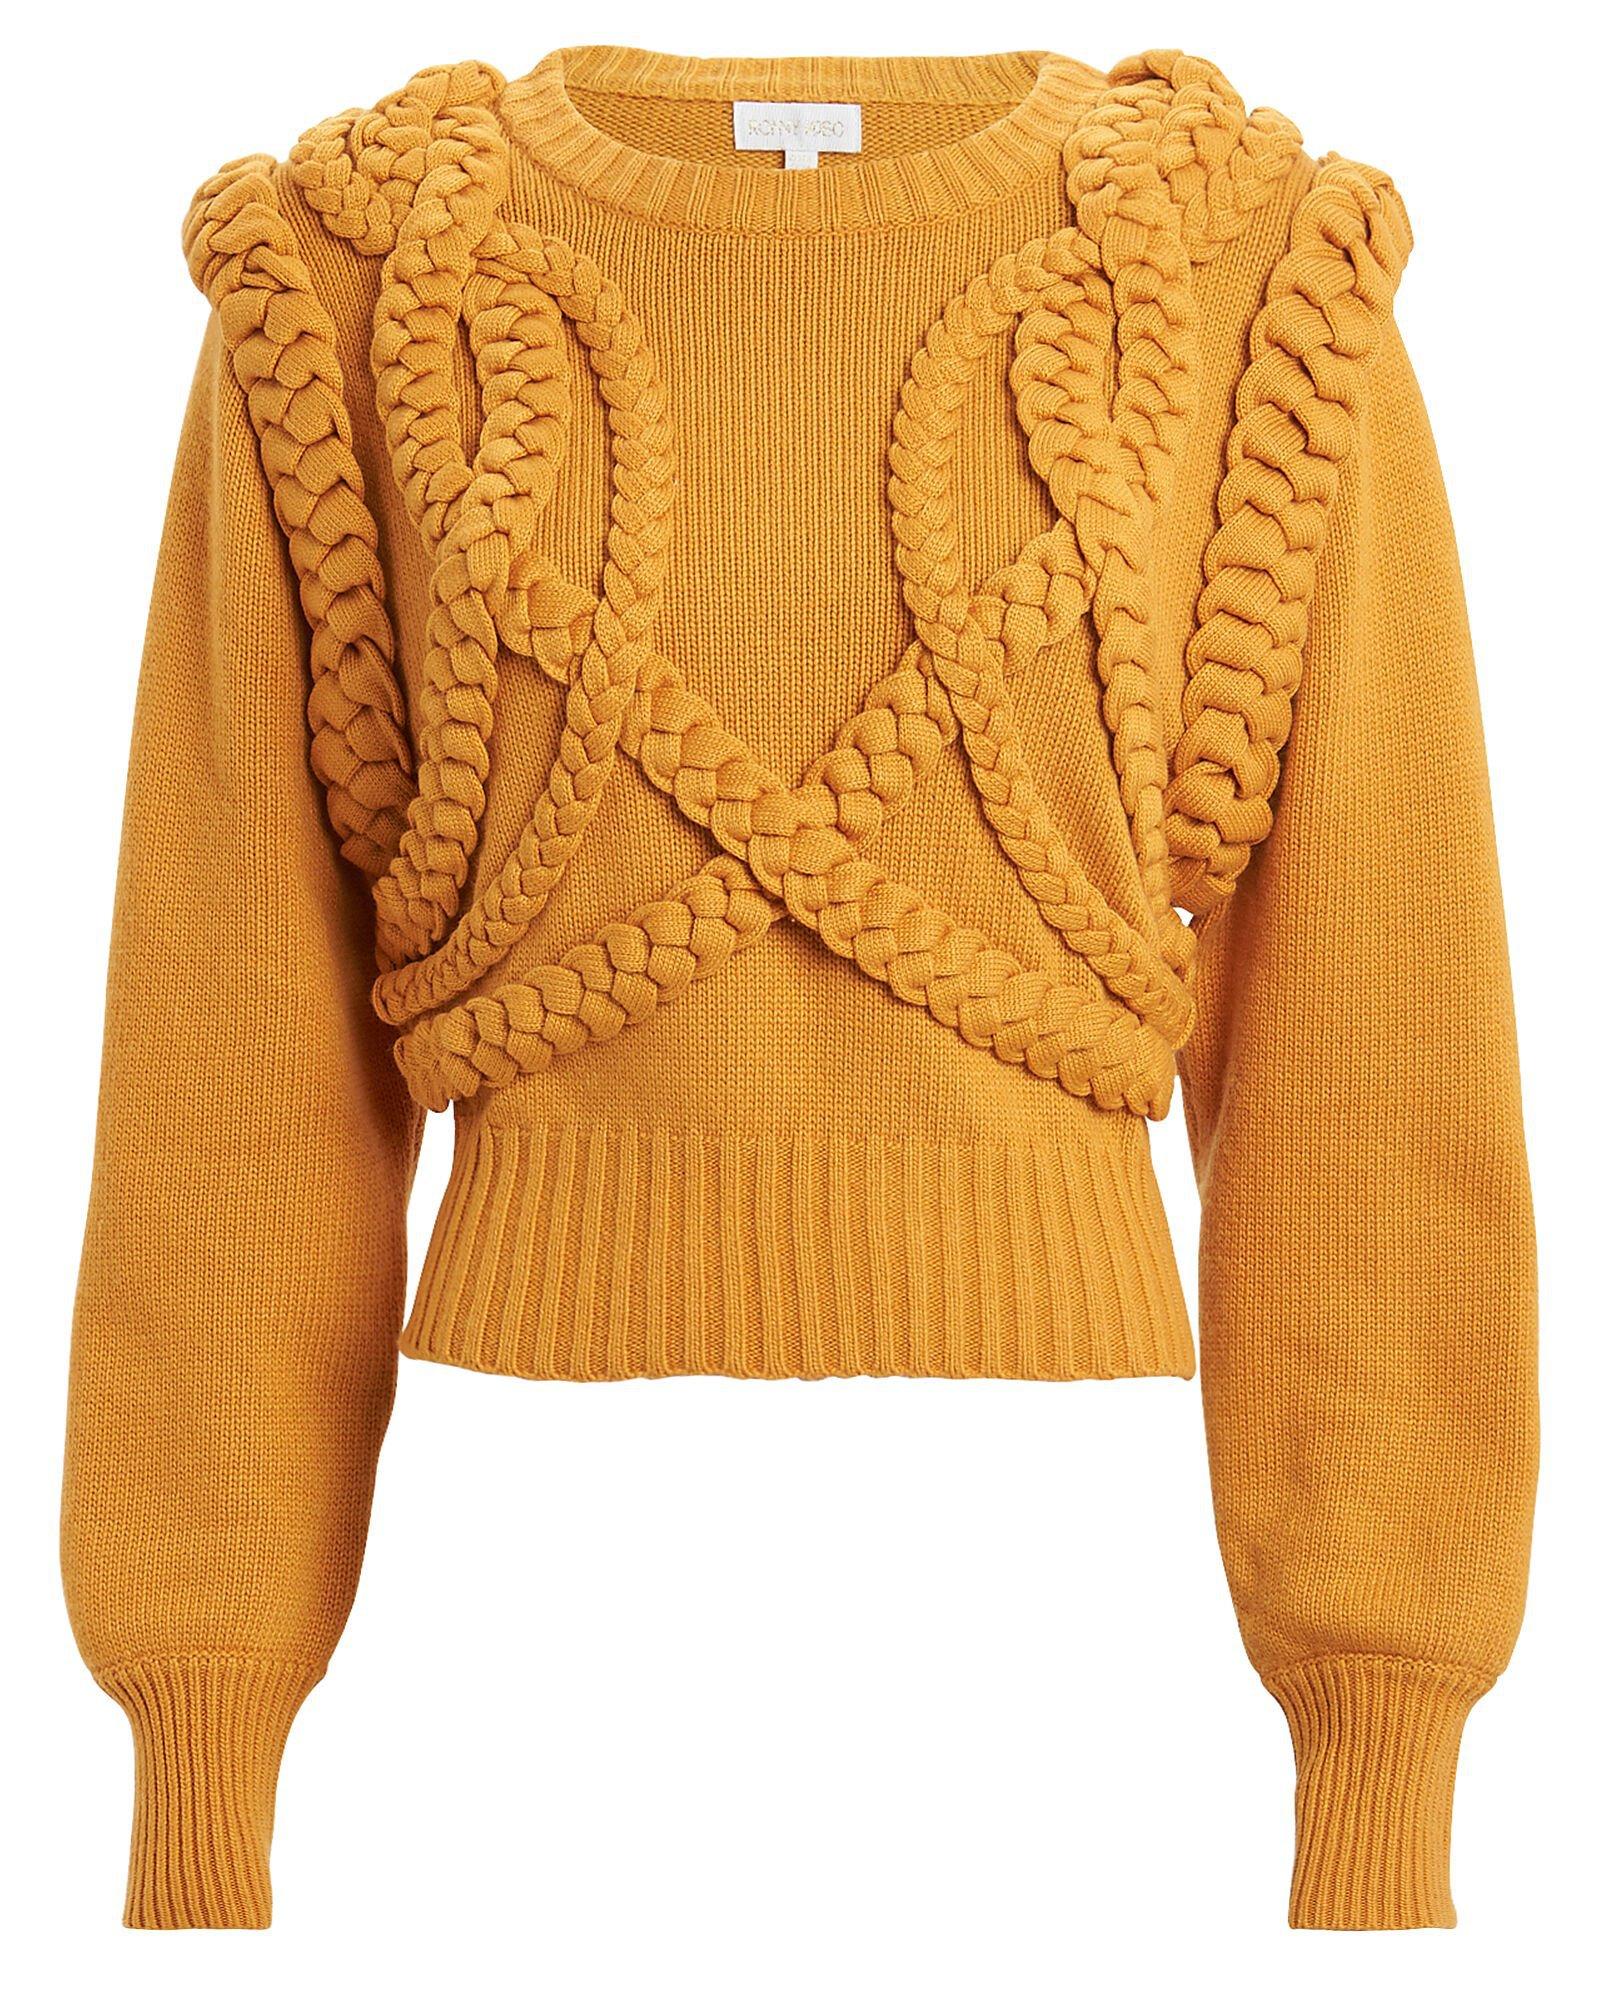 Ronny Kobo | Yeva Cable Knit Sweater | INTERMIX®